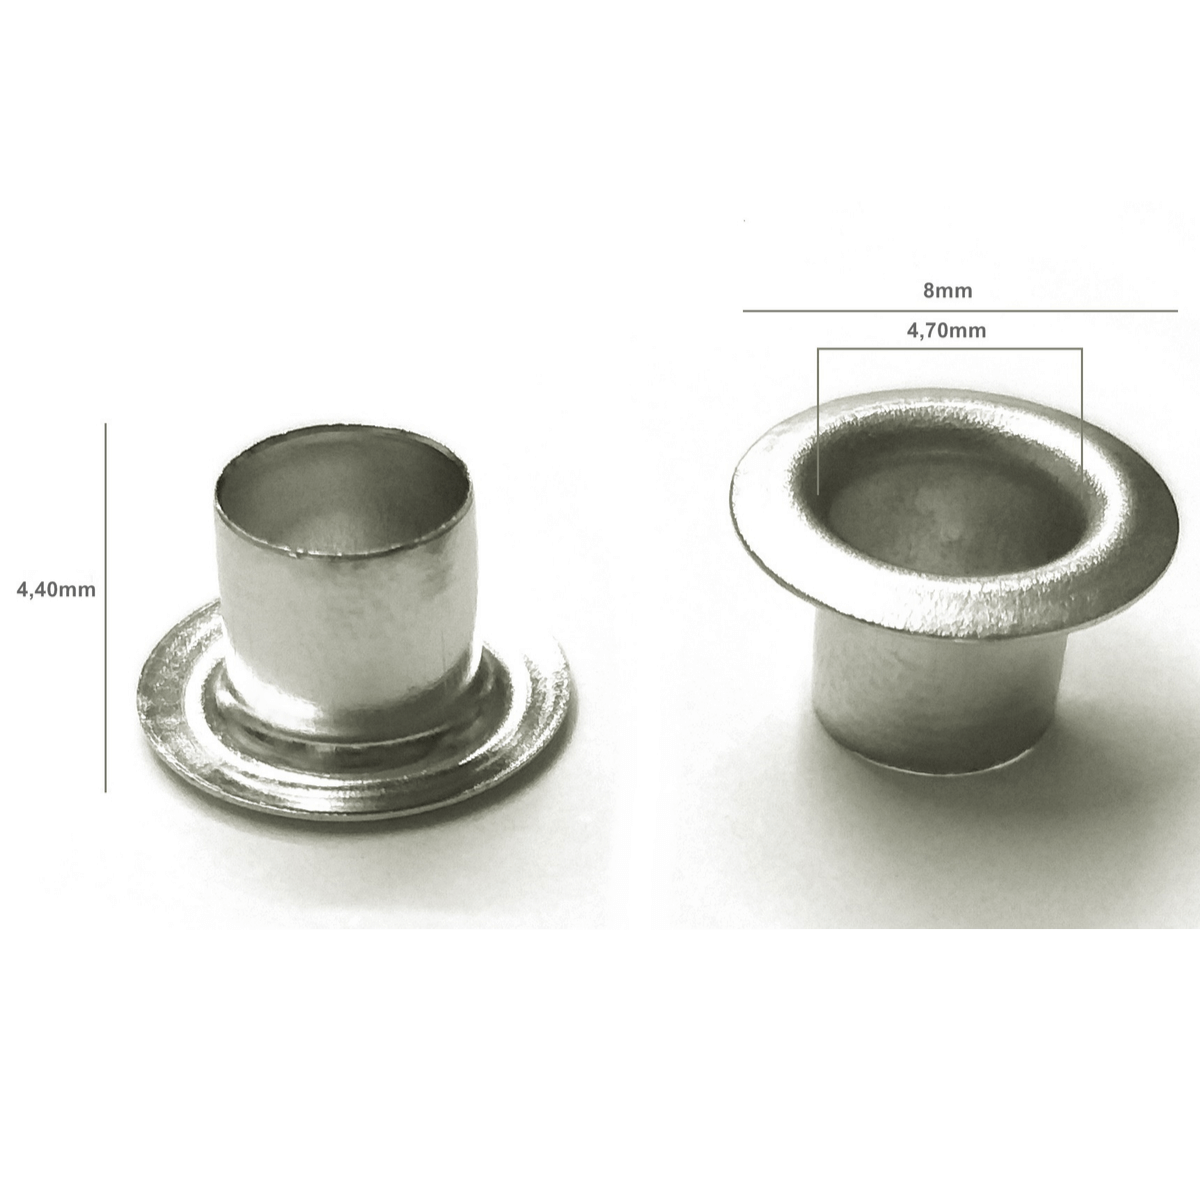 Ilhós Alumínio Rosa Nº 54 8mm de diâmetro externo